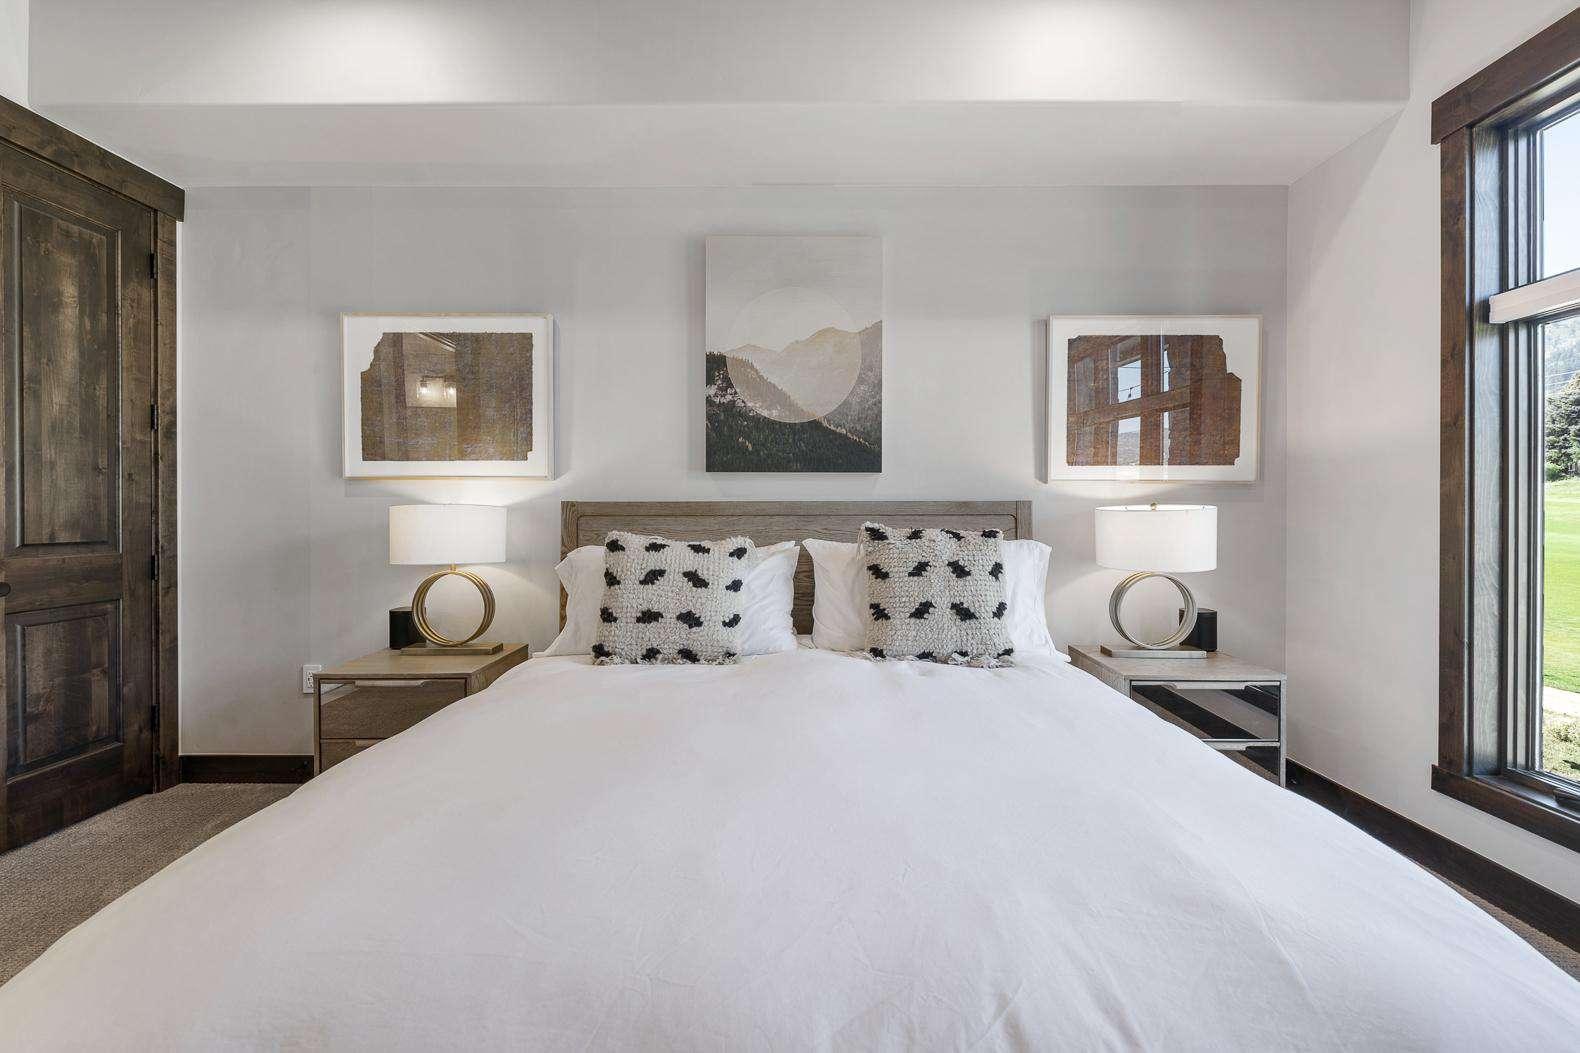 Guest Bedroom King Bed